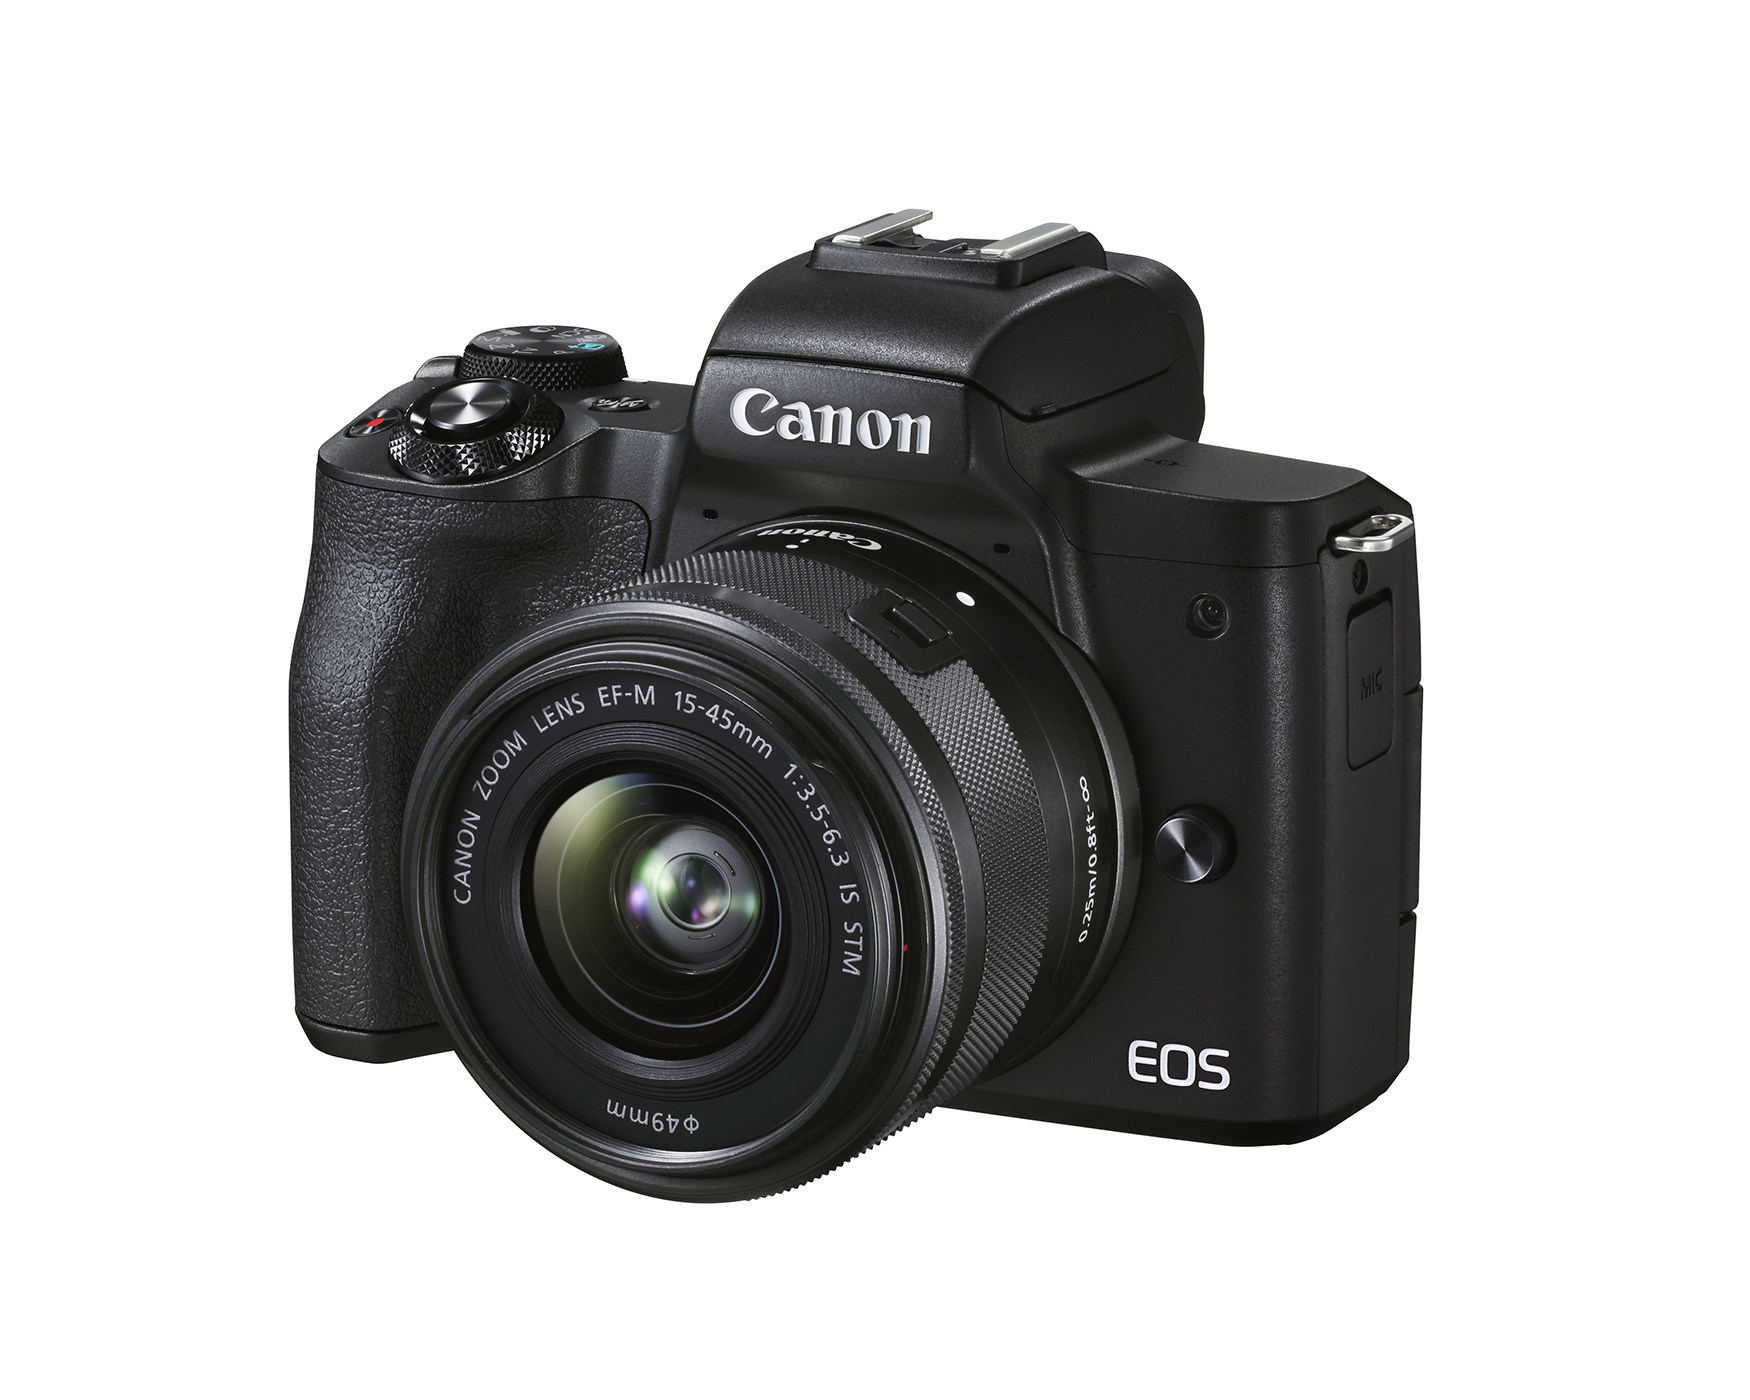 Canon EOS M50 Mark II (Canon U.S.A., Inc.)